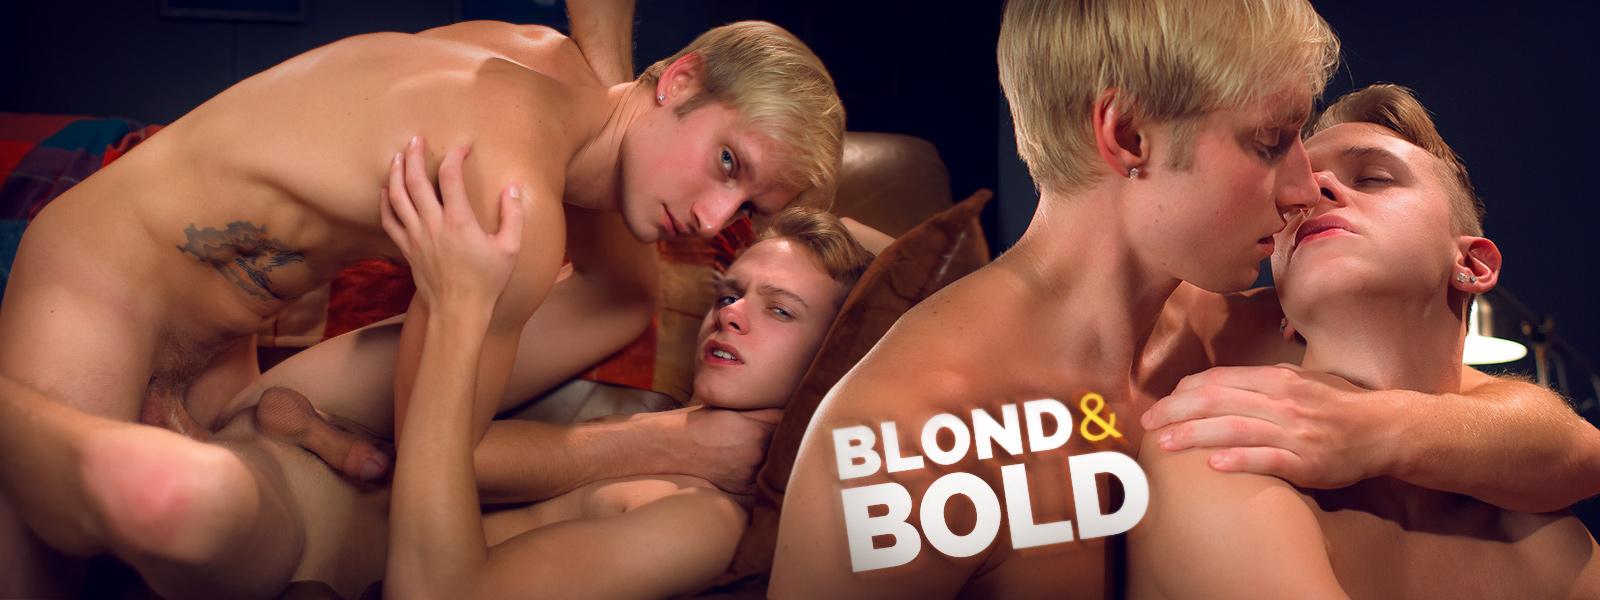 Blond & Bold